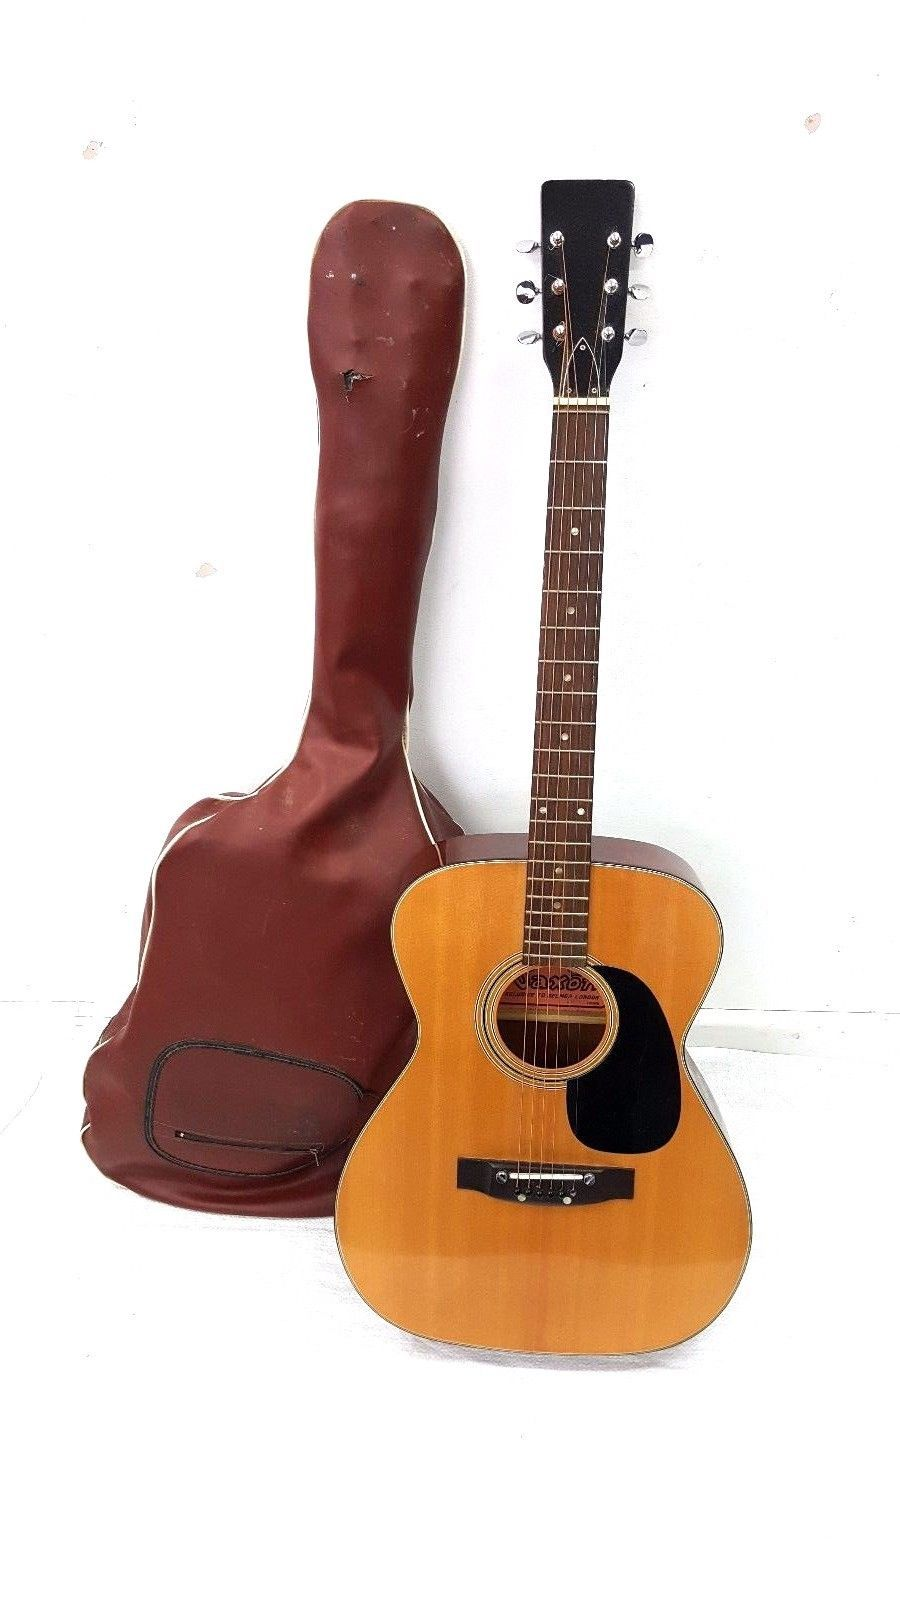 Saxon Folk Model No 812 Acoustic Guitar And Case Zb606 Ebay